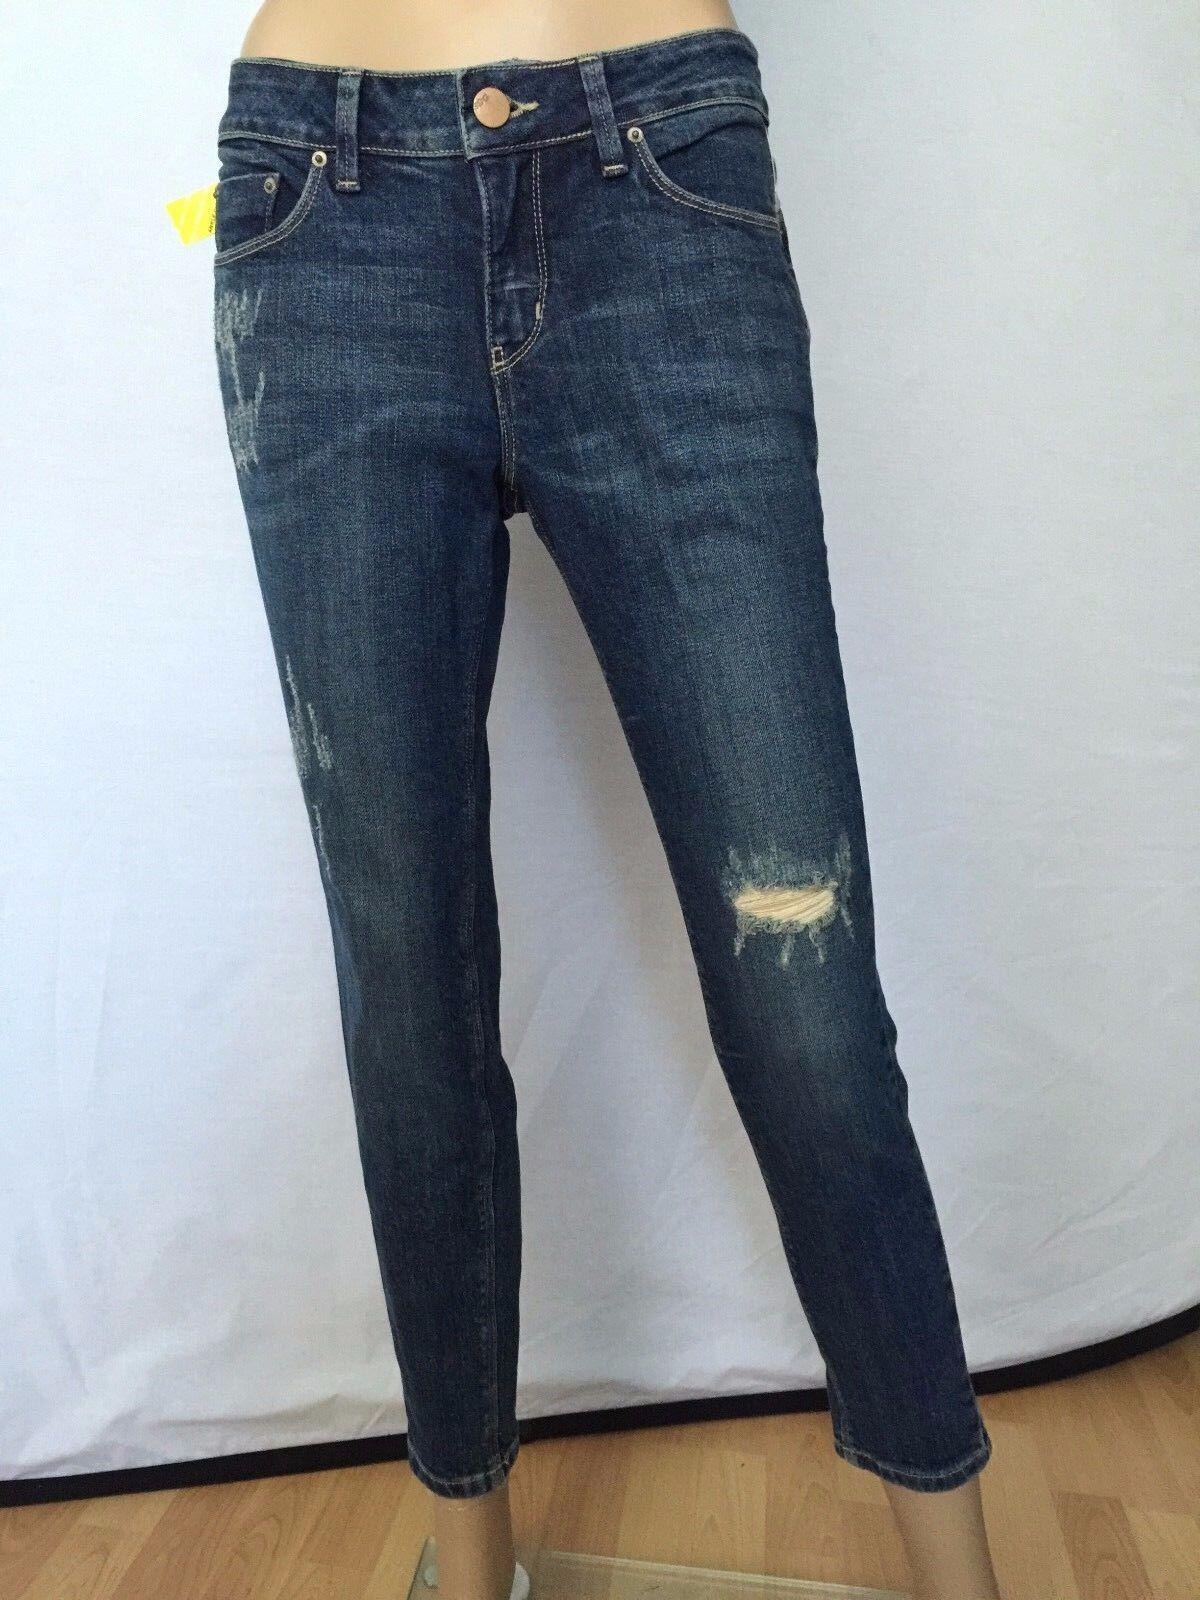 New Urban Outfitters BDG bluee Capri Pants Boyfriend Jeans Size 28